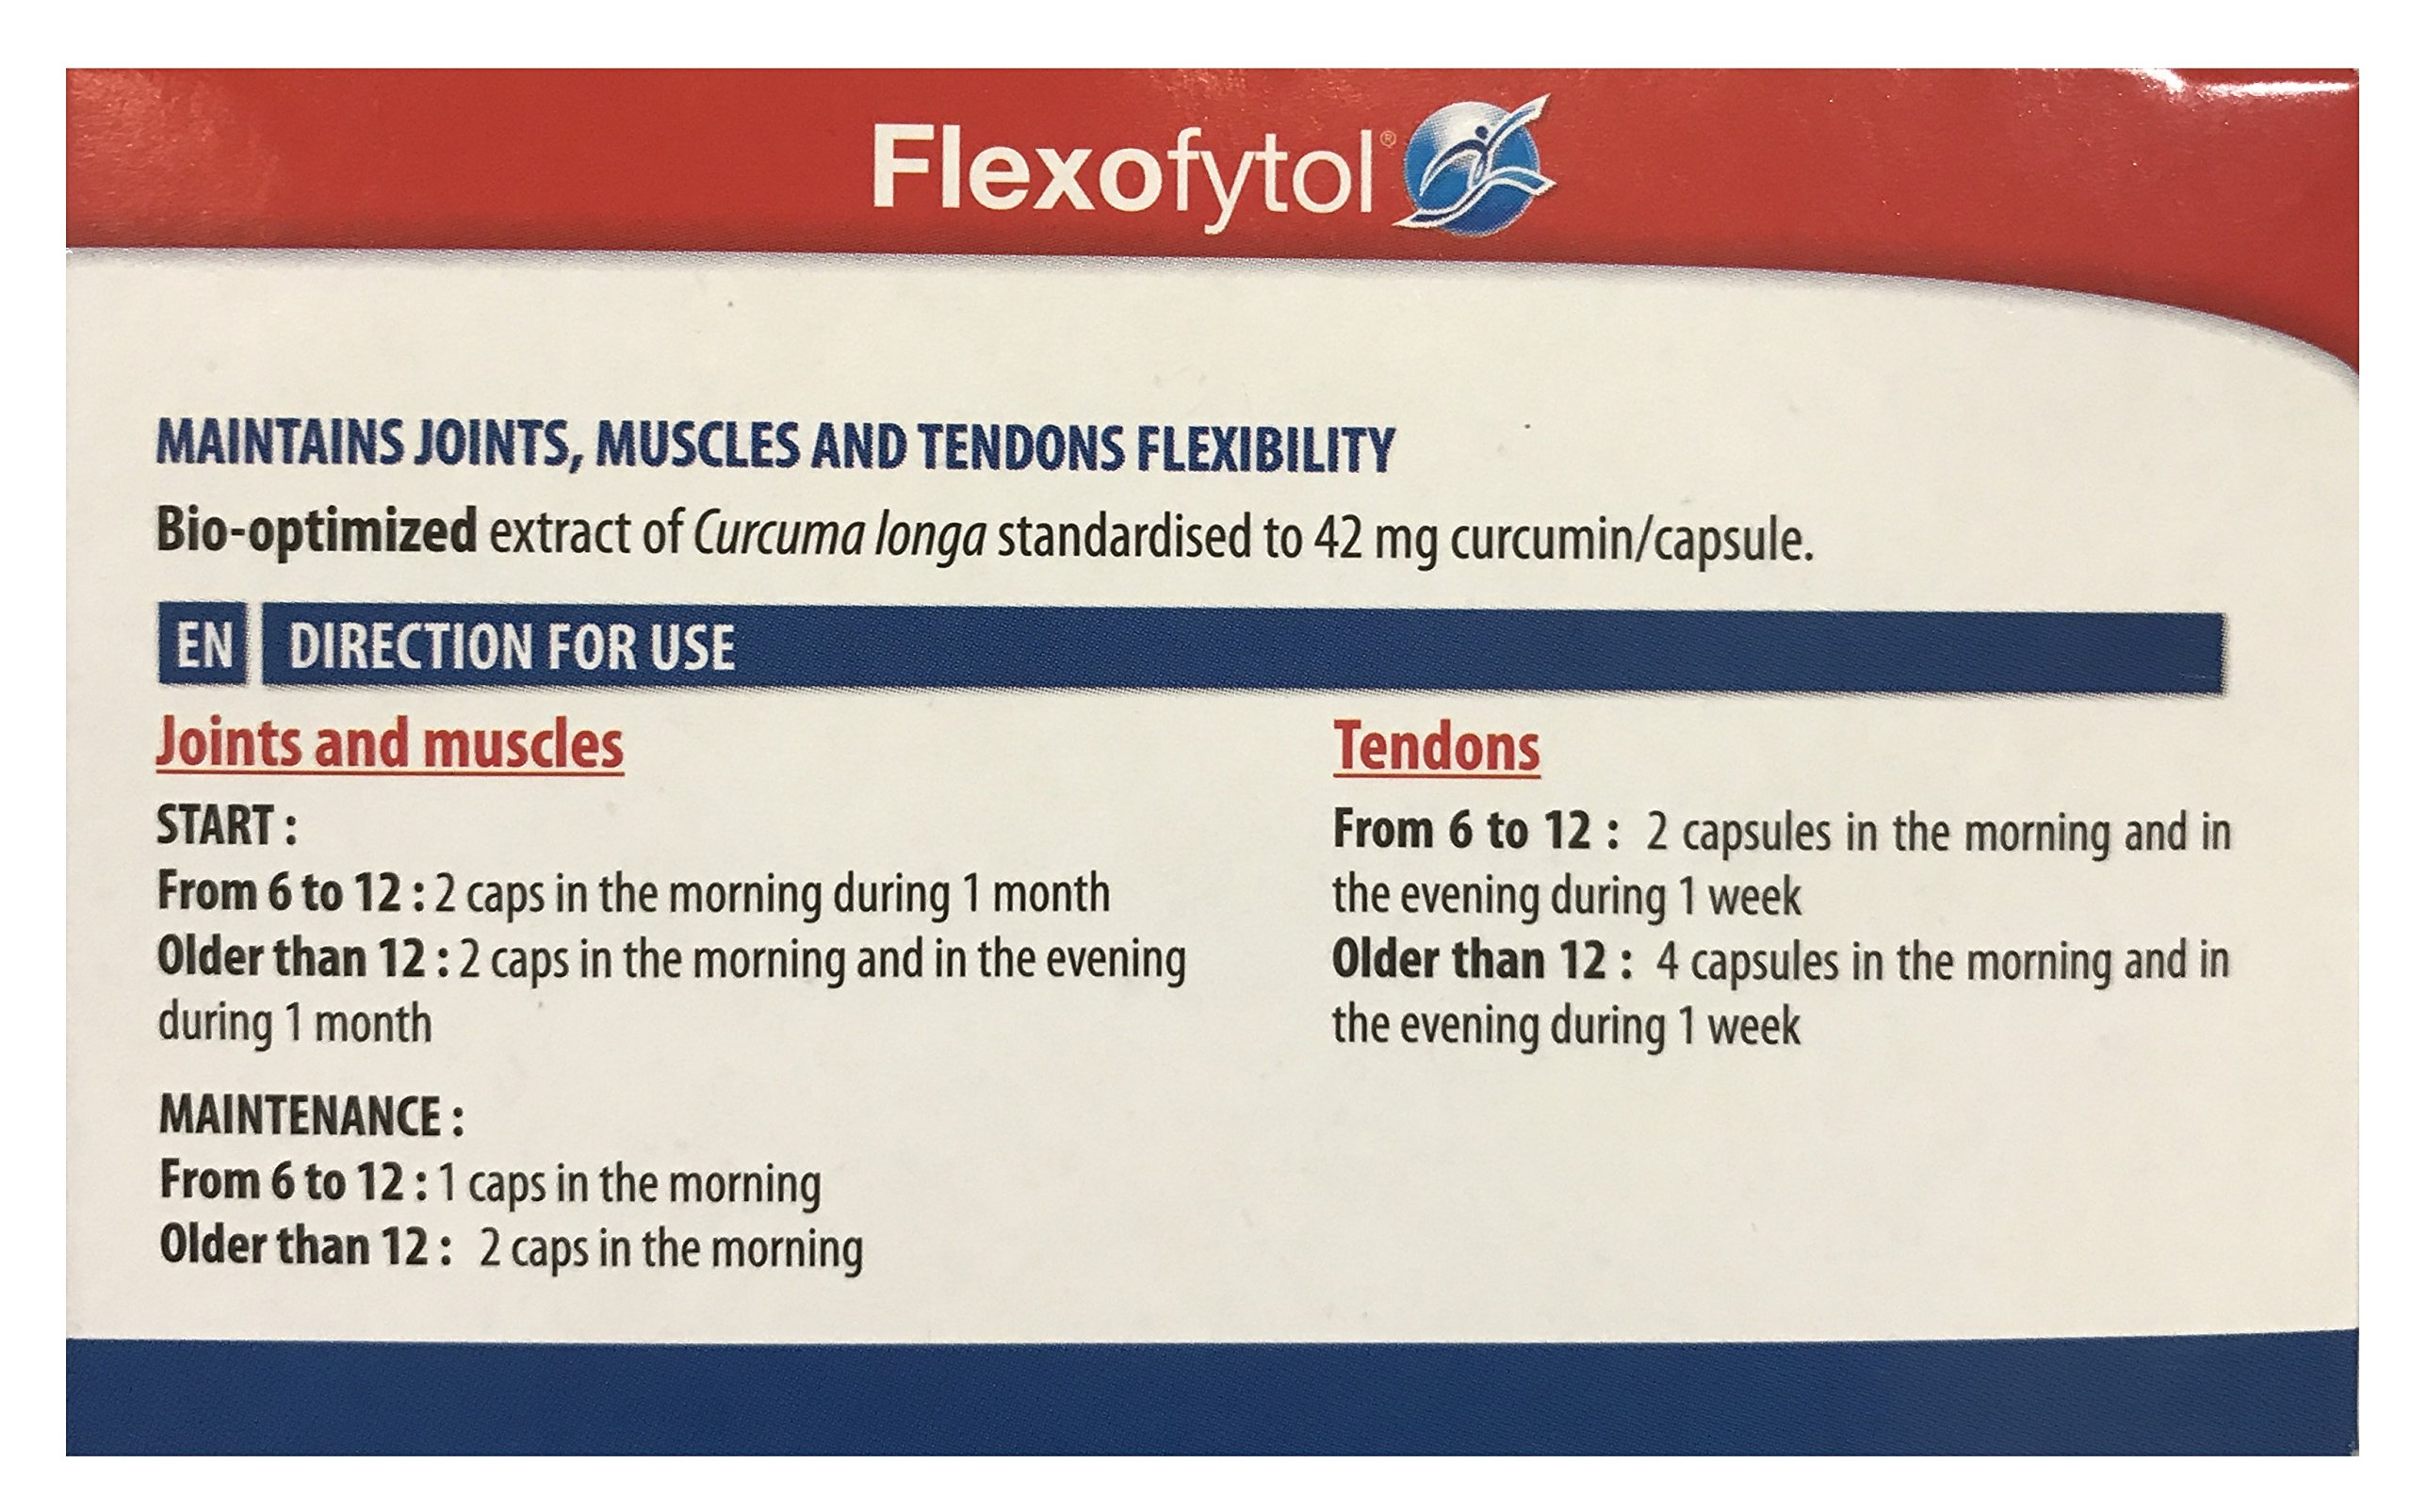 Flexofytol Bio-optimized Turmeric Extract for Joints and Arthritis  - 180 Gel-Caps